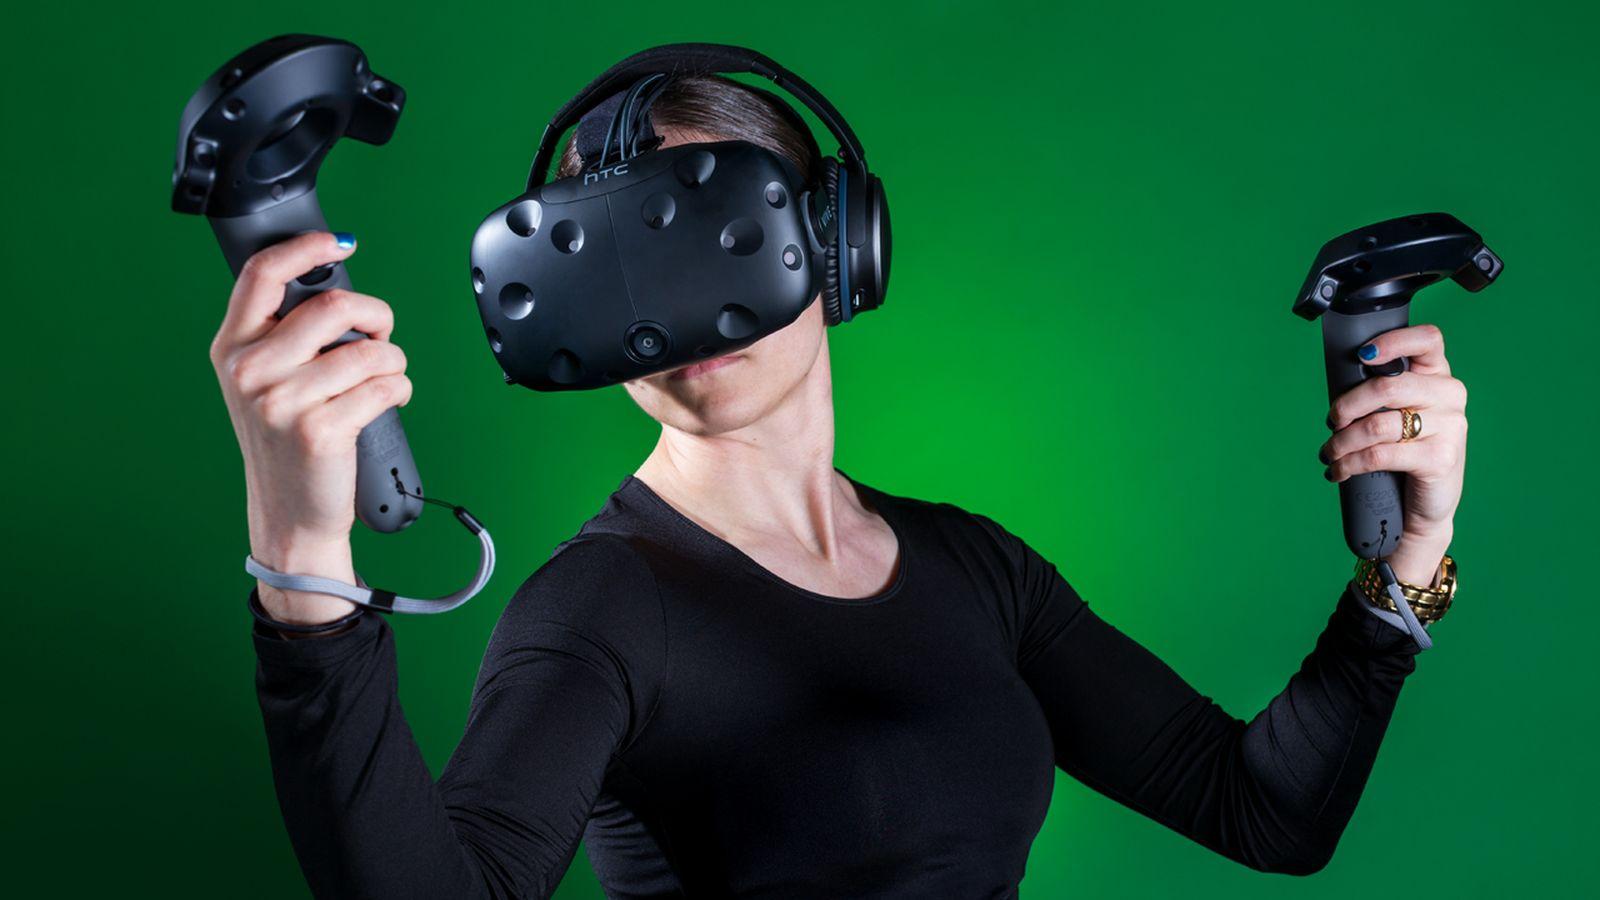 HTC Vive VR device